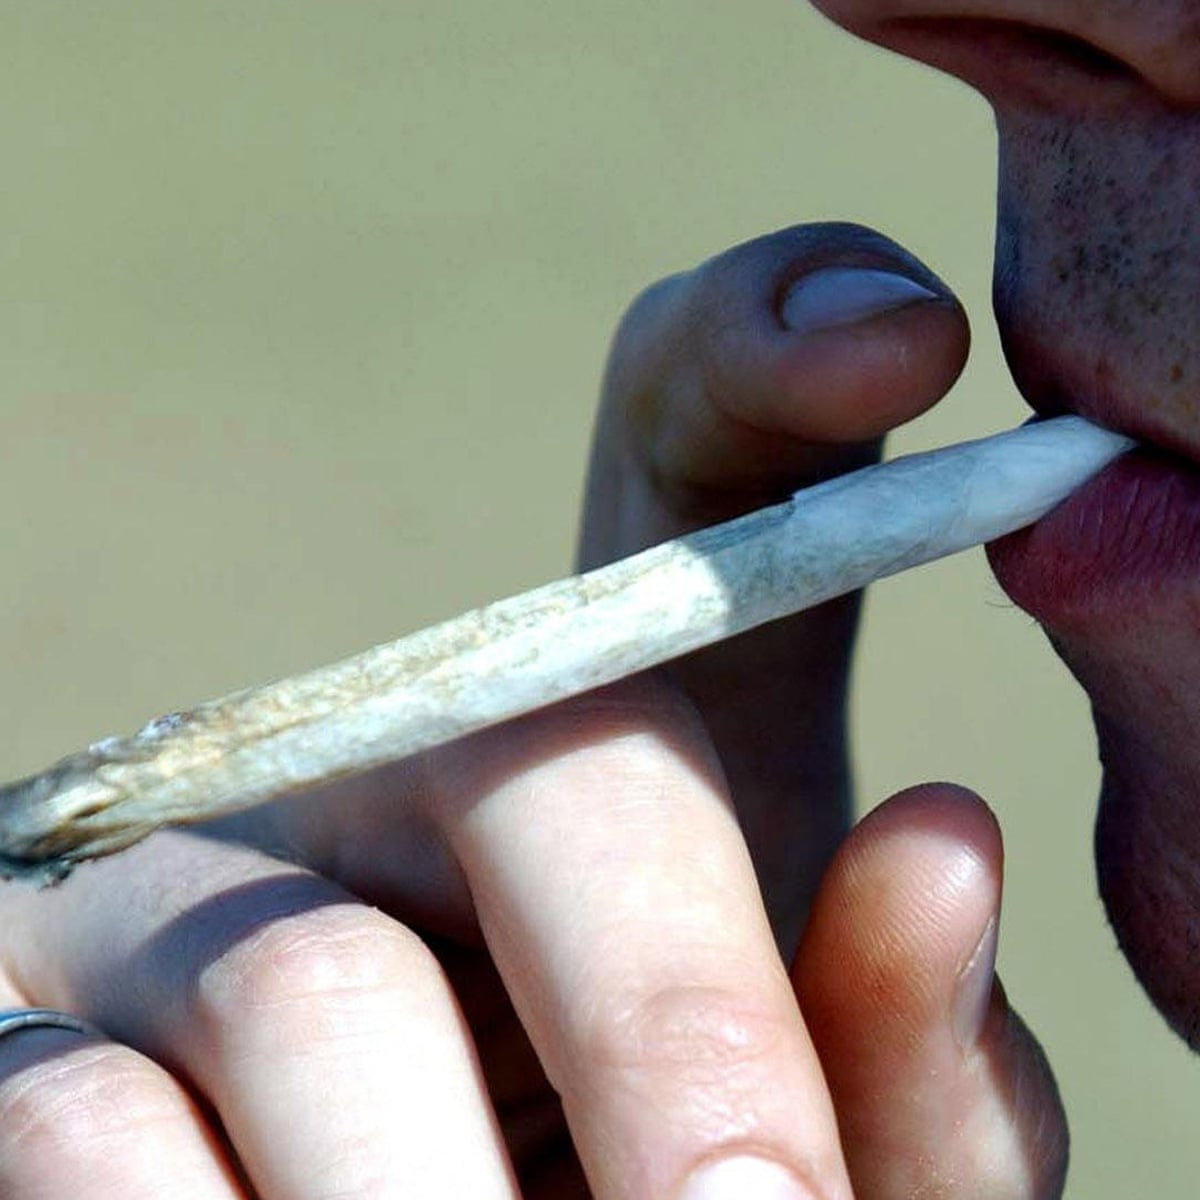 Pics of teens somking weed